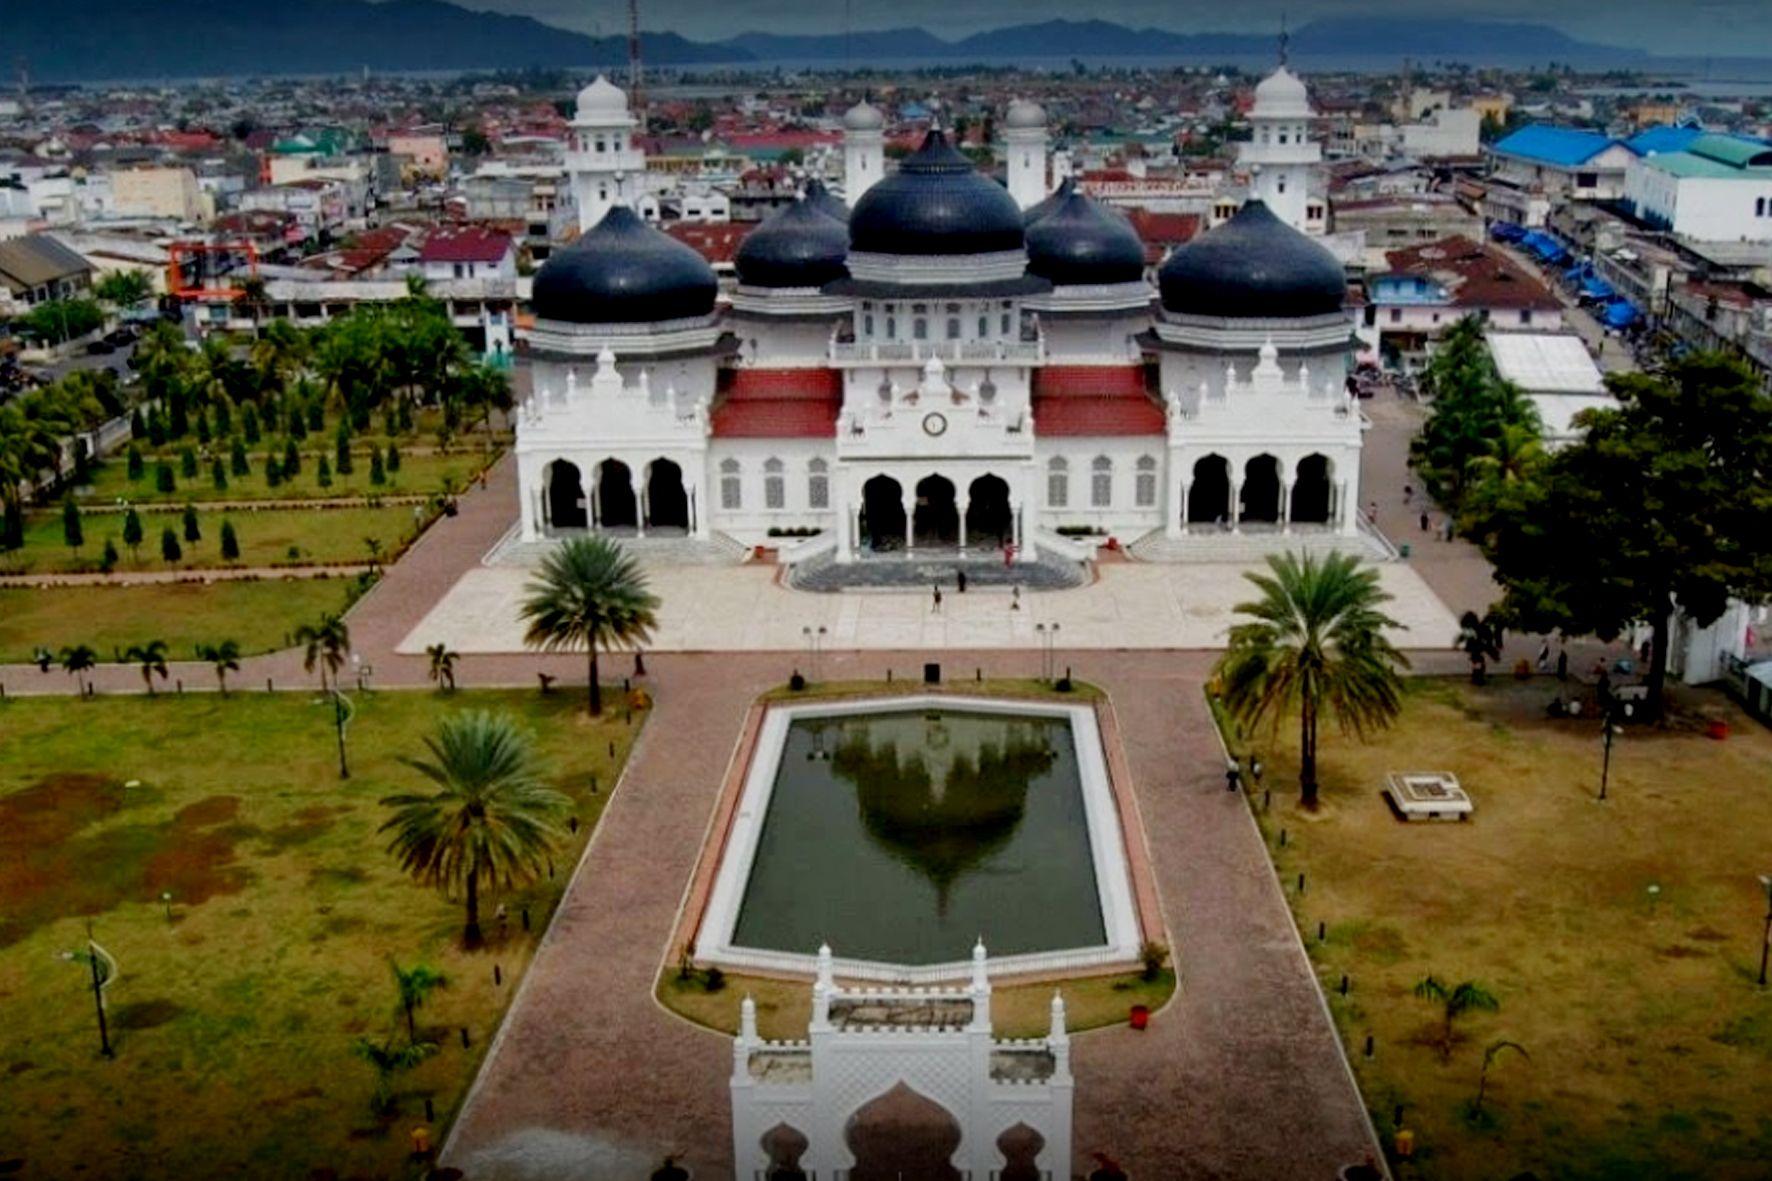 Mesjid Raya Baiturrahman Banda Aceh Indonesia Steemkr Masjid Melalui Berbagai